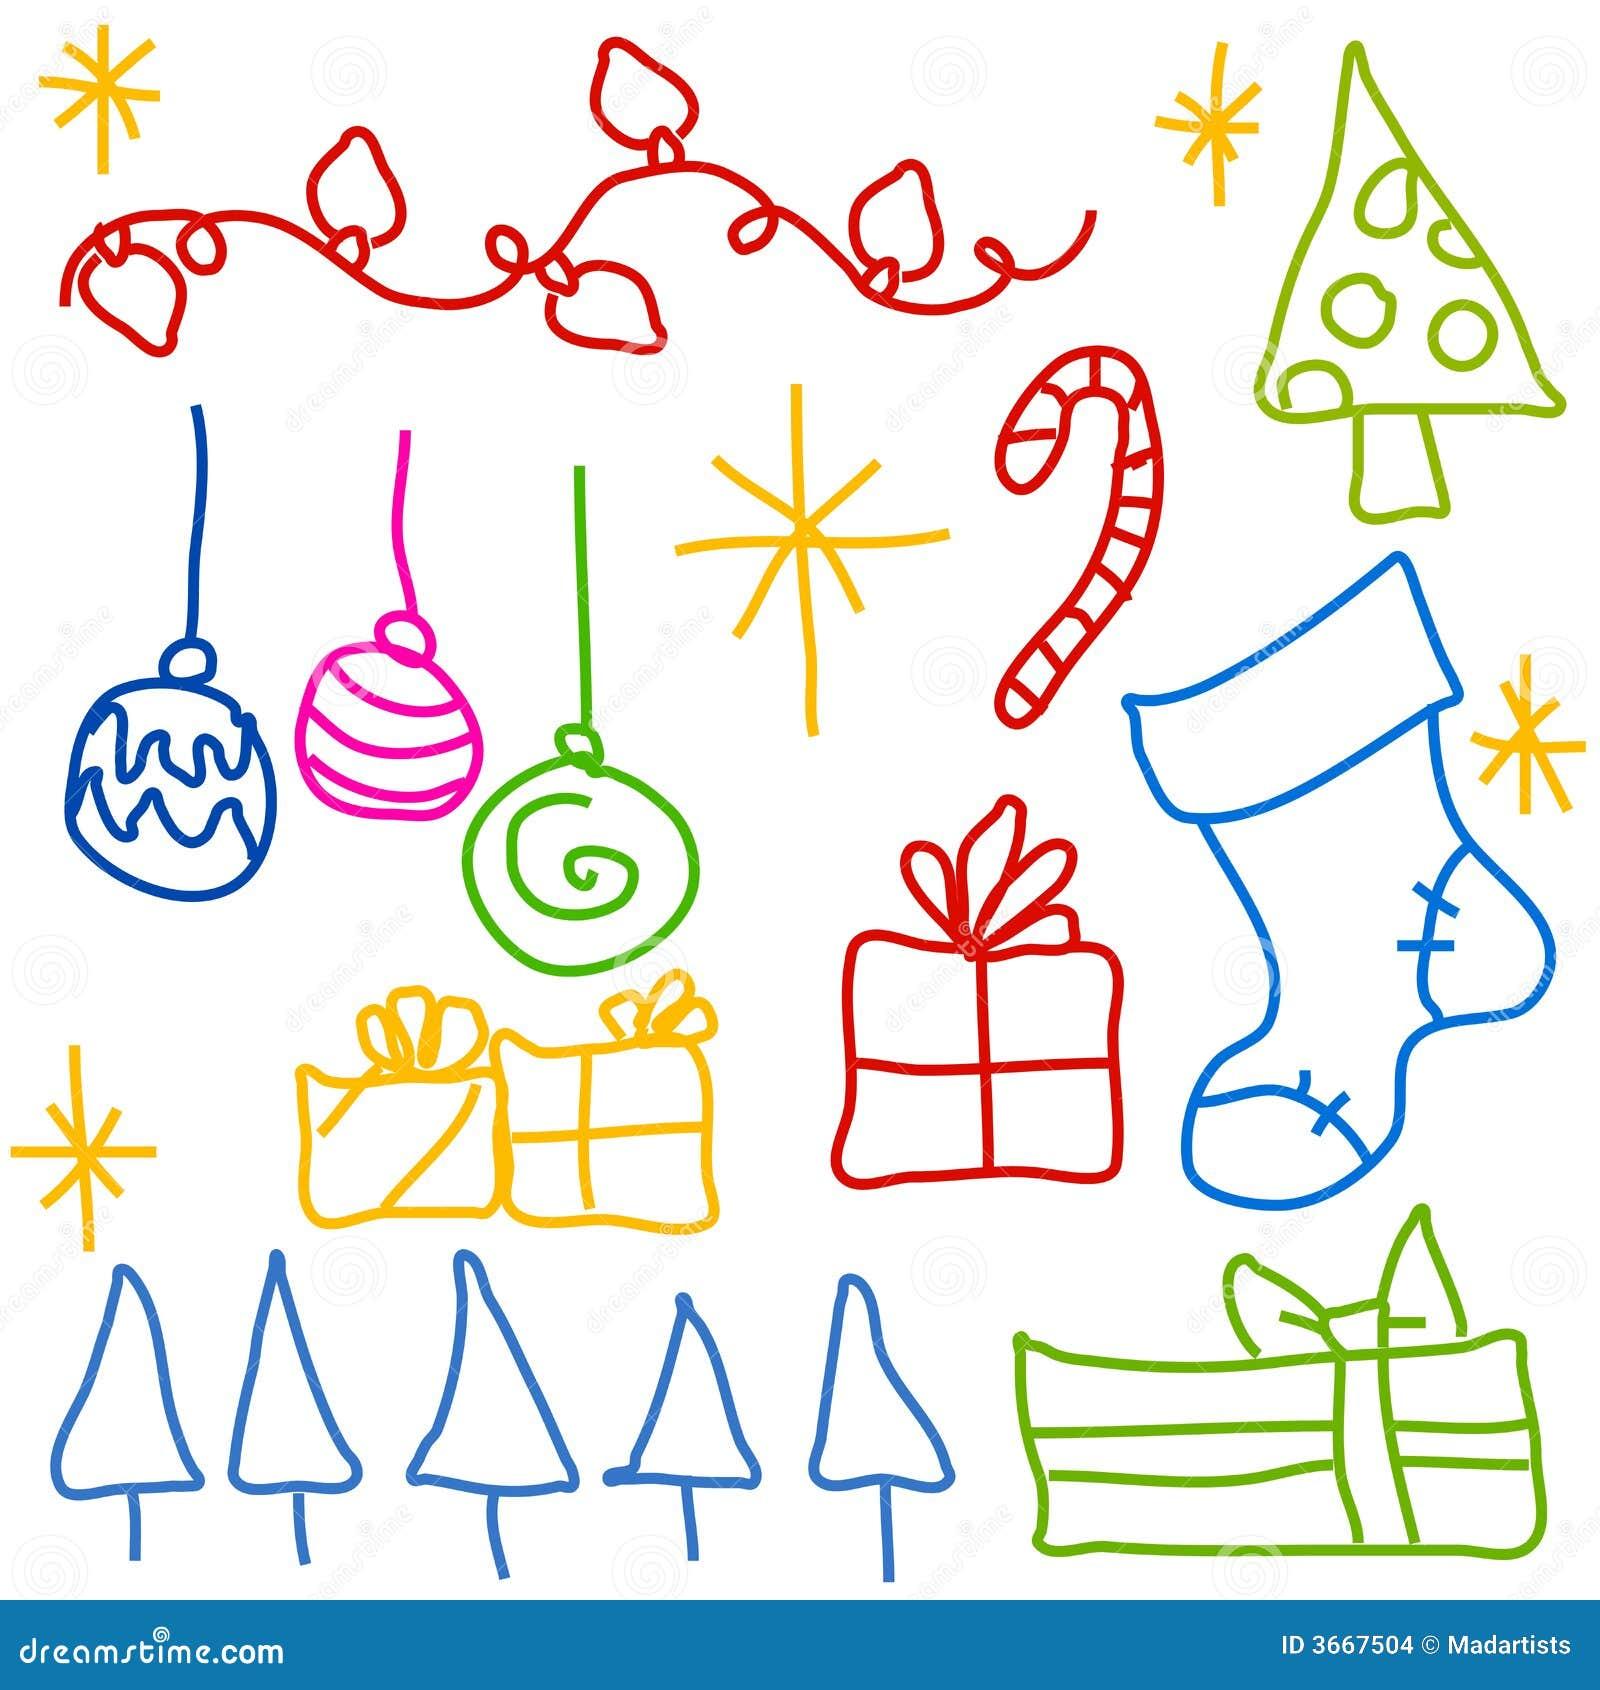 childlike christmas doodle drawings stock illustration rh dreamstime com Back to School Doodles KPM Doodles Clip Art